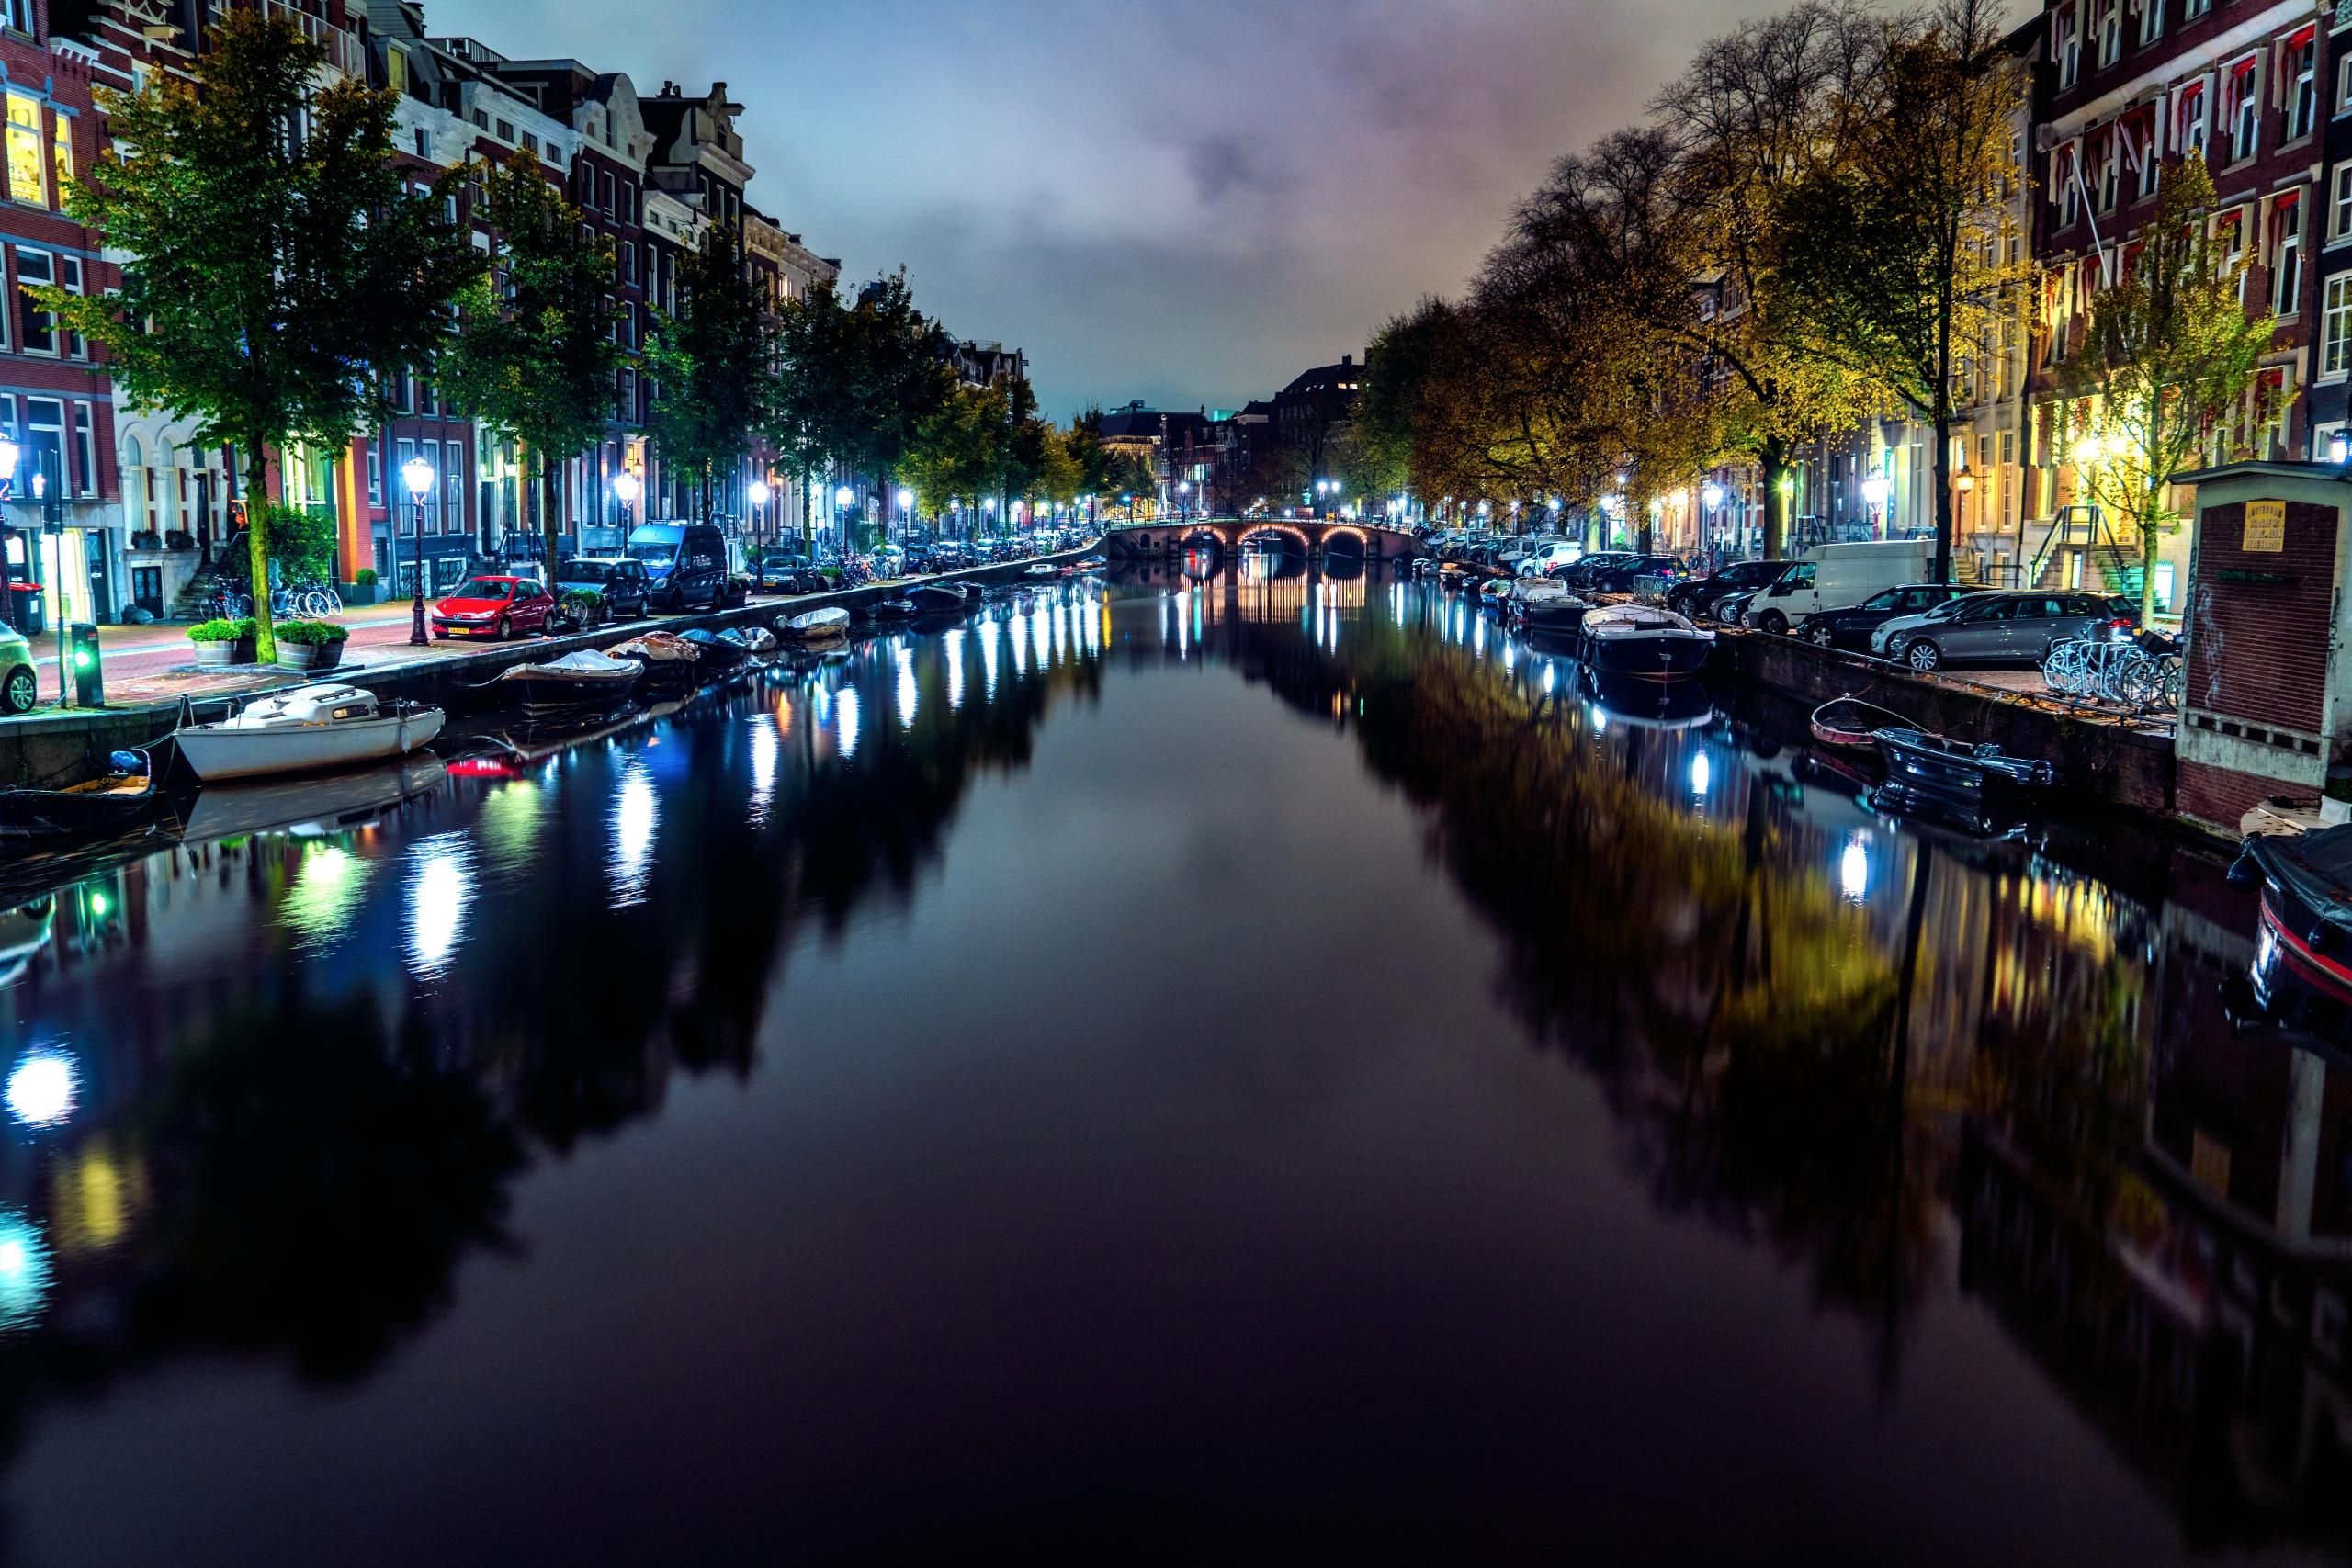 Amsterdam Early Morning Hours s - rickschwartz   ello